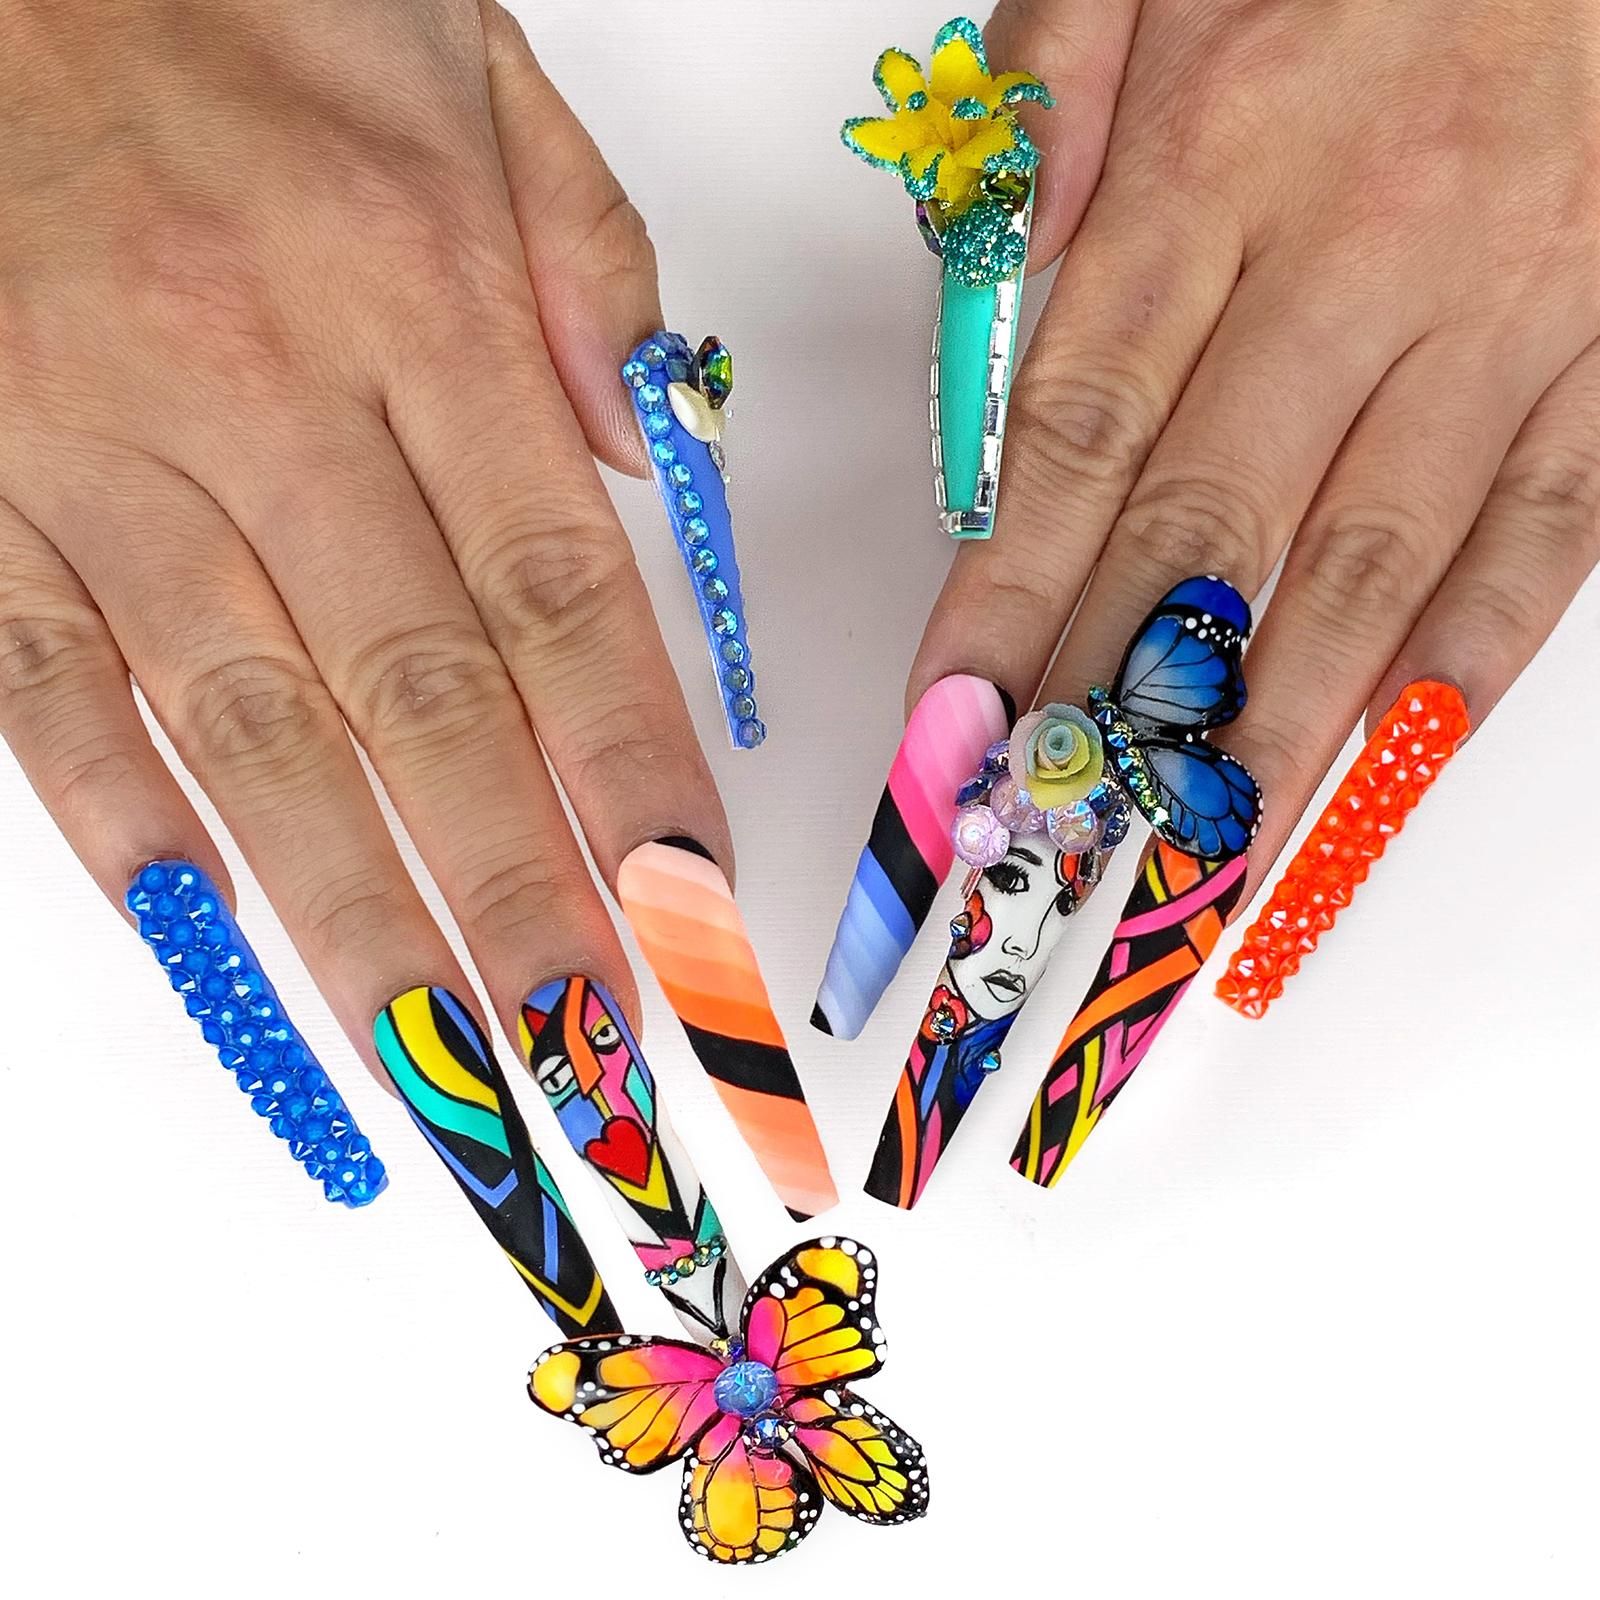 NTNA S. 7 Pre-Challenge 2: Butterfly Nail Art (Honey)